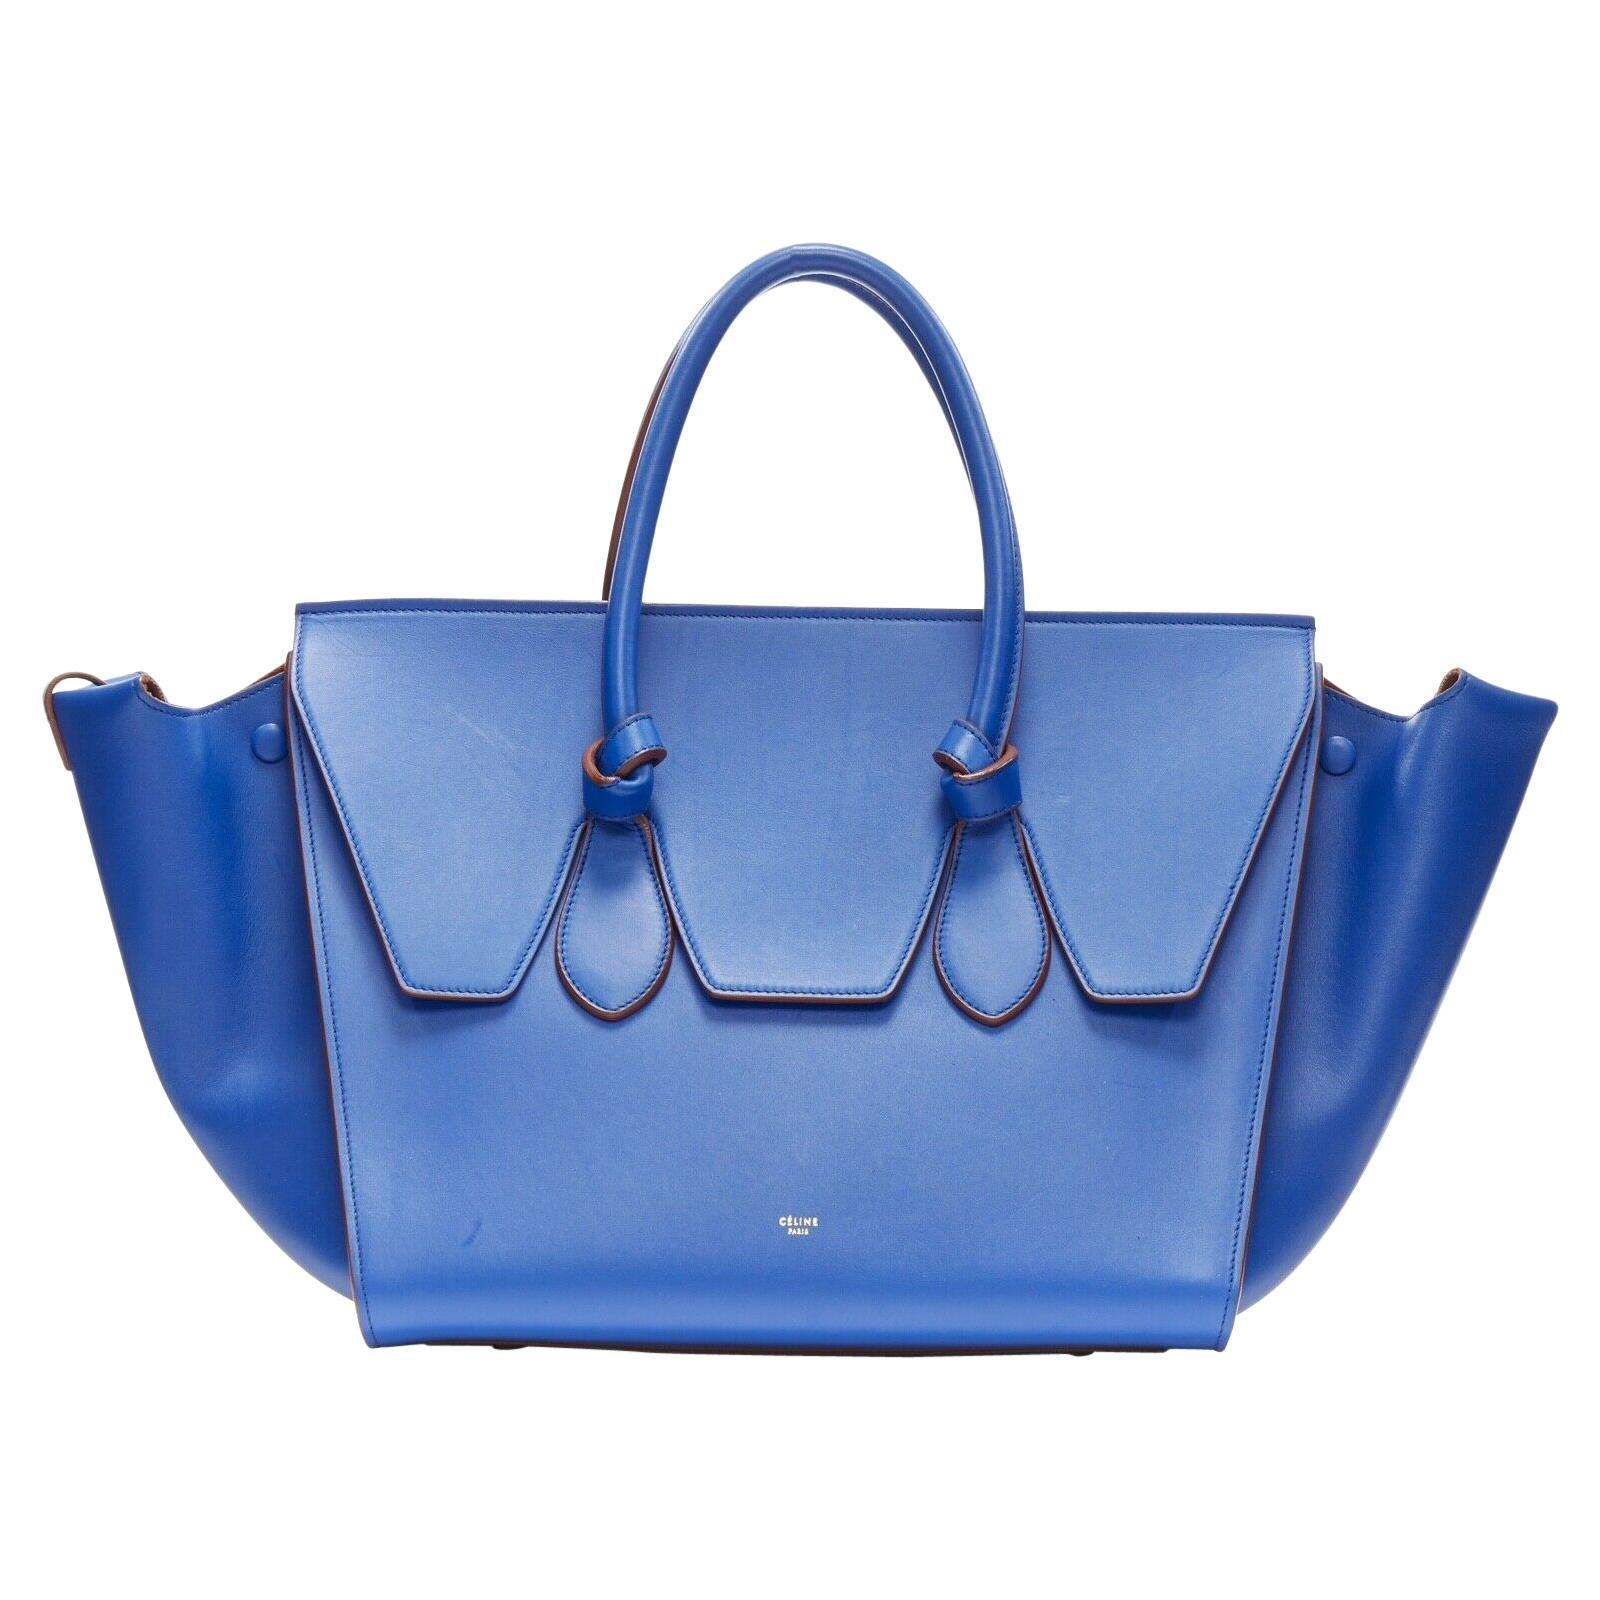 new CELINE PHOEBE PHILO Knot cobalt blue calfskin large shopper tote bag full